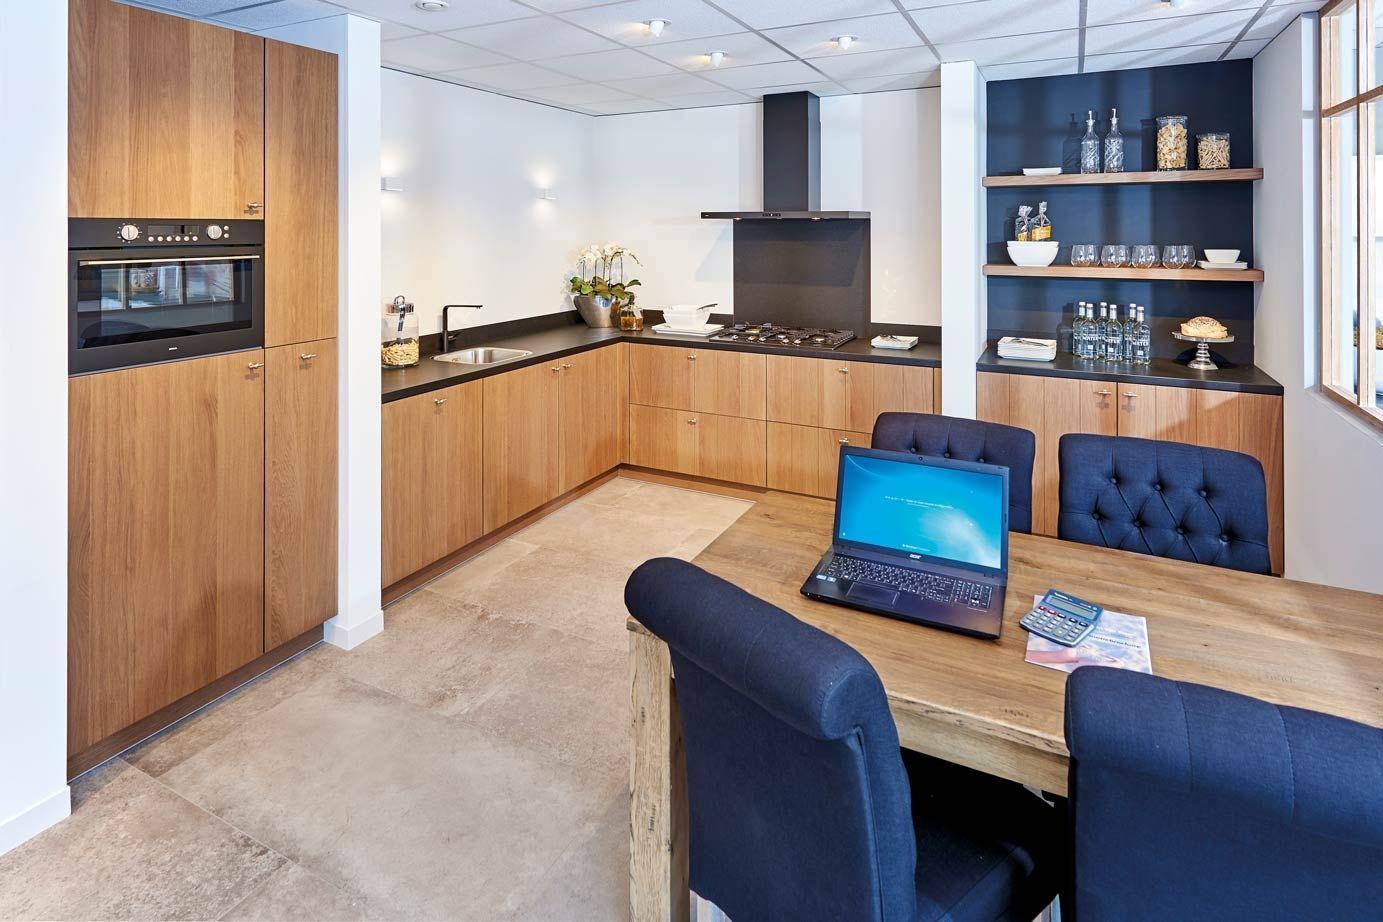 Kosten Luxe Keuken : Luxe keuken vervangen kosten decorati kitchen